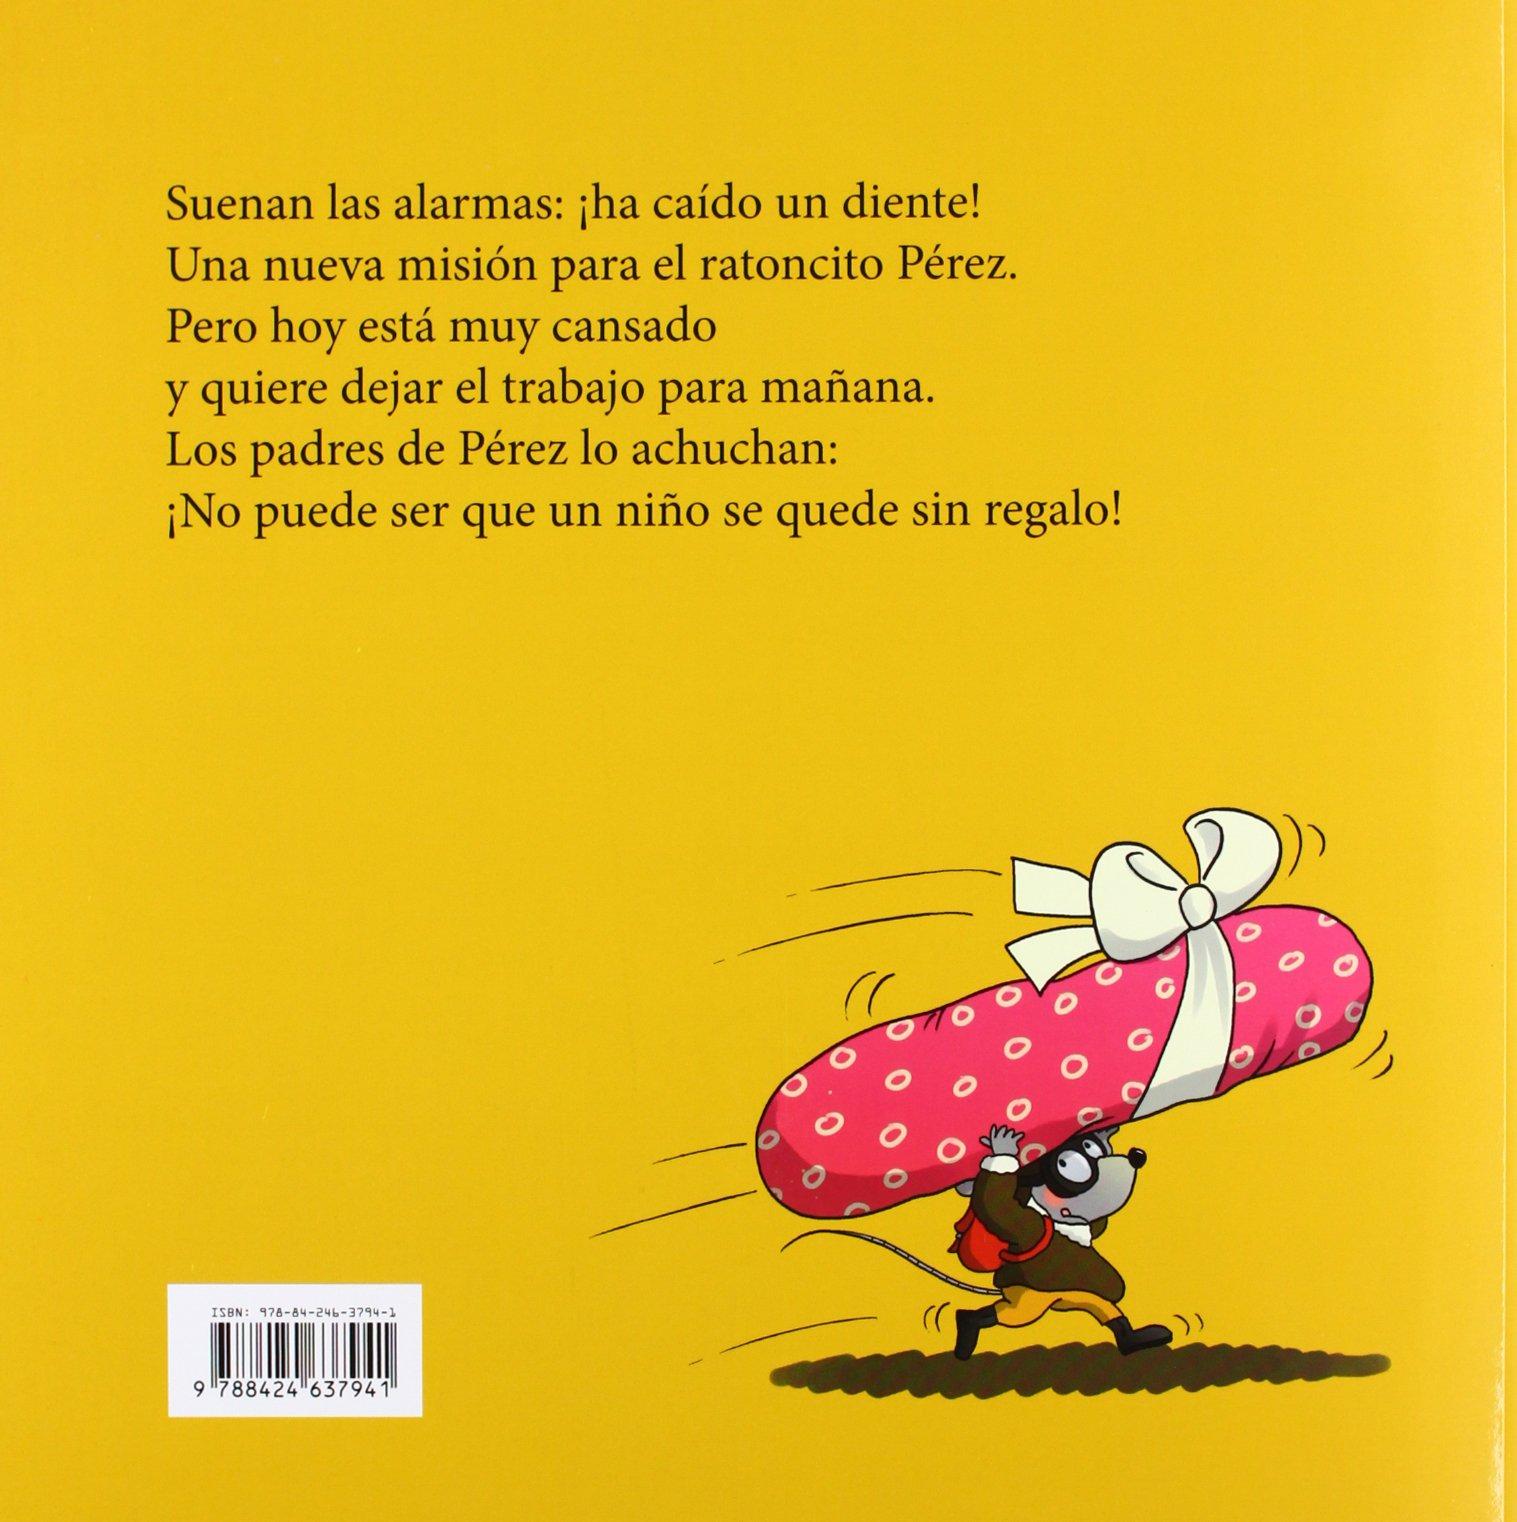 El ratoncito Pérez (Tradiciones): Amazon.es: Anna Canyelles, Roser  Calafell: Libros